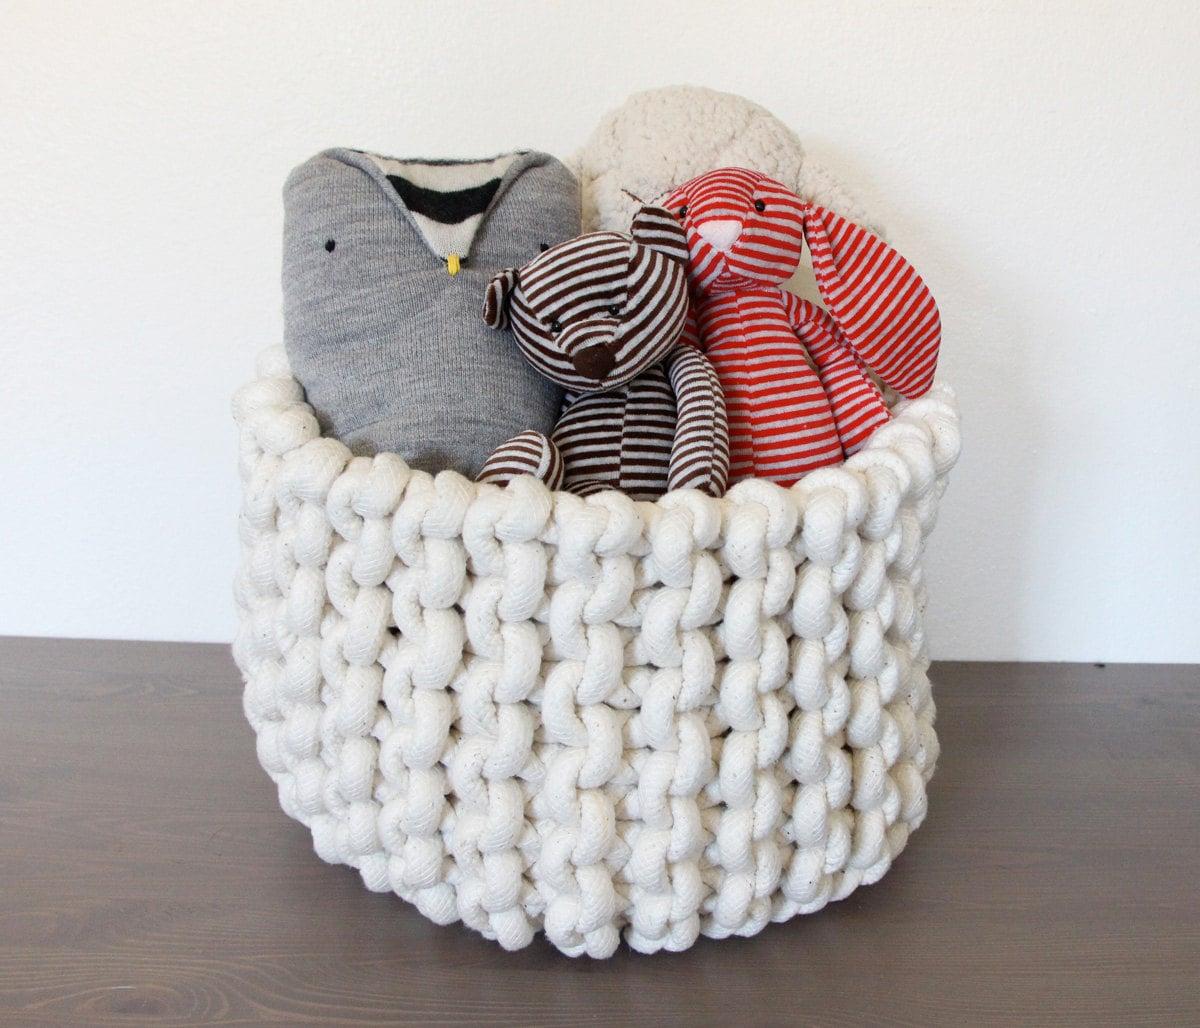 Knitting Rope Machine : Large knit rope basket